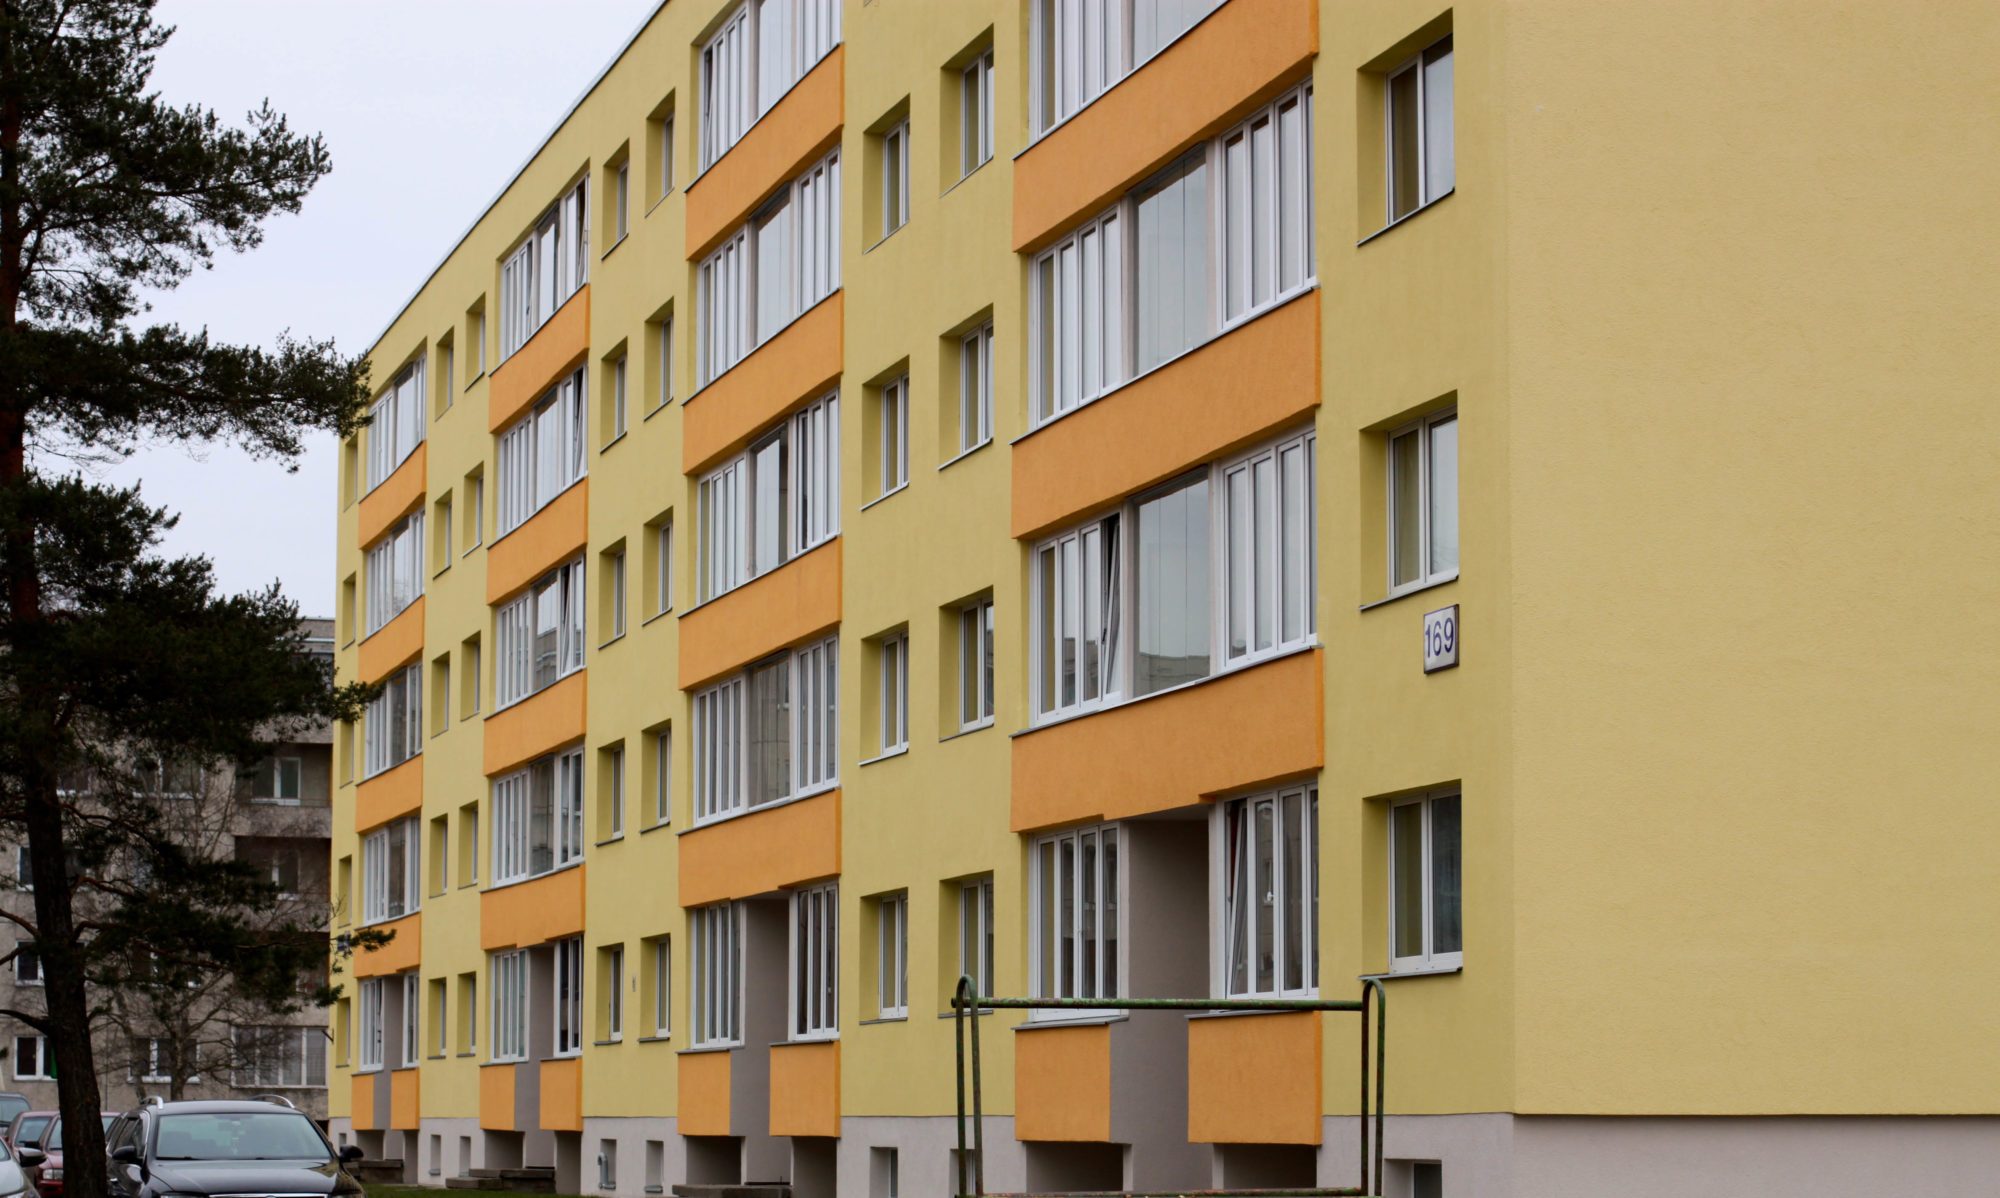 Irroniset Ehitus OÜ